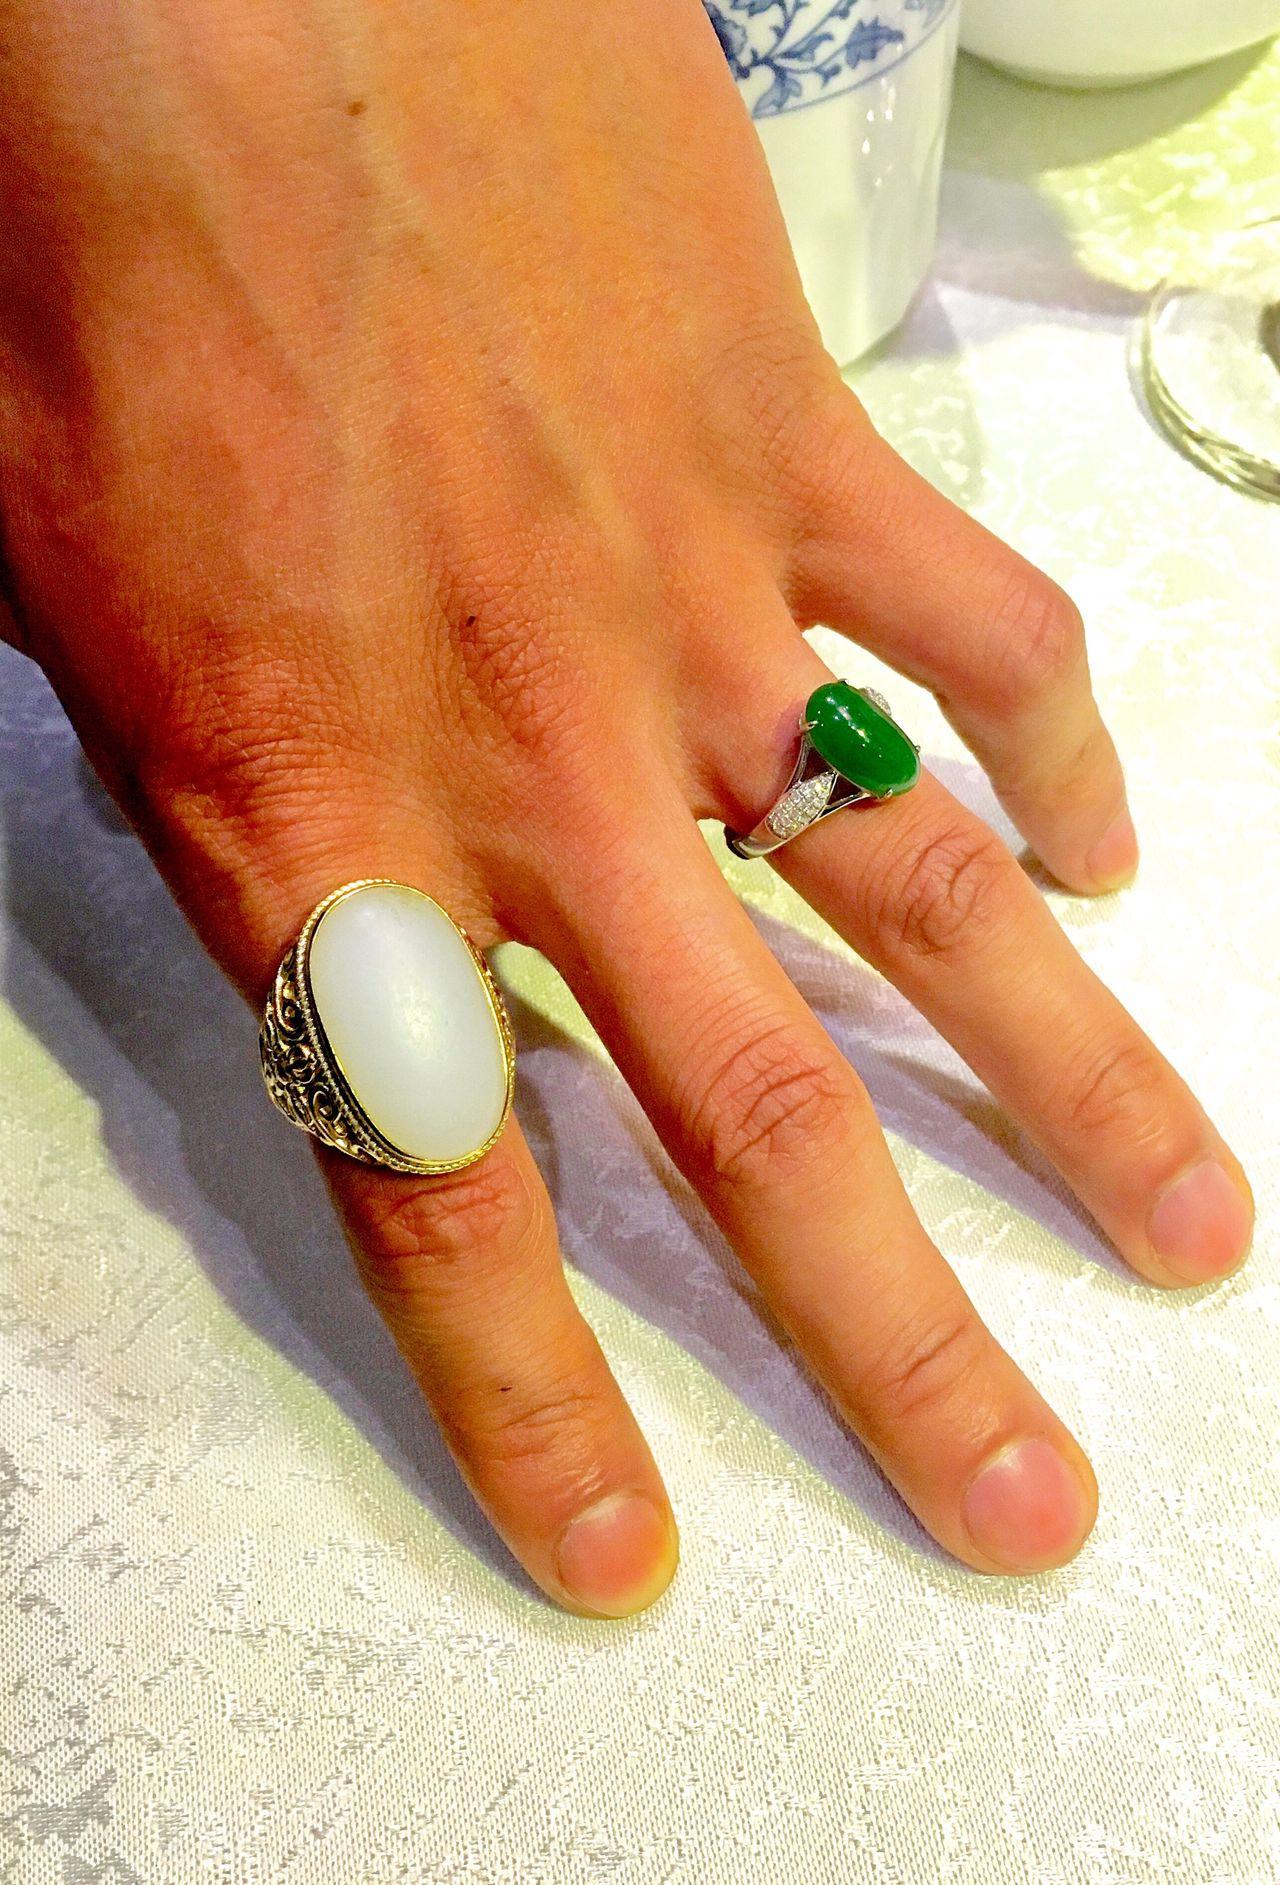 Human Hand Human Finger Jade Jewel Jade Green White Jade Jade Stones Jade Fingerring Finger Rings Valuable Jewels Jade In China Human Body Part Fingernail Trading With Jade